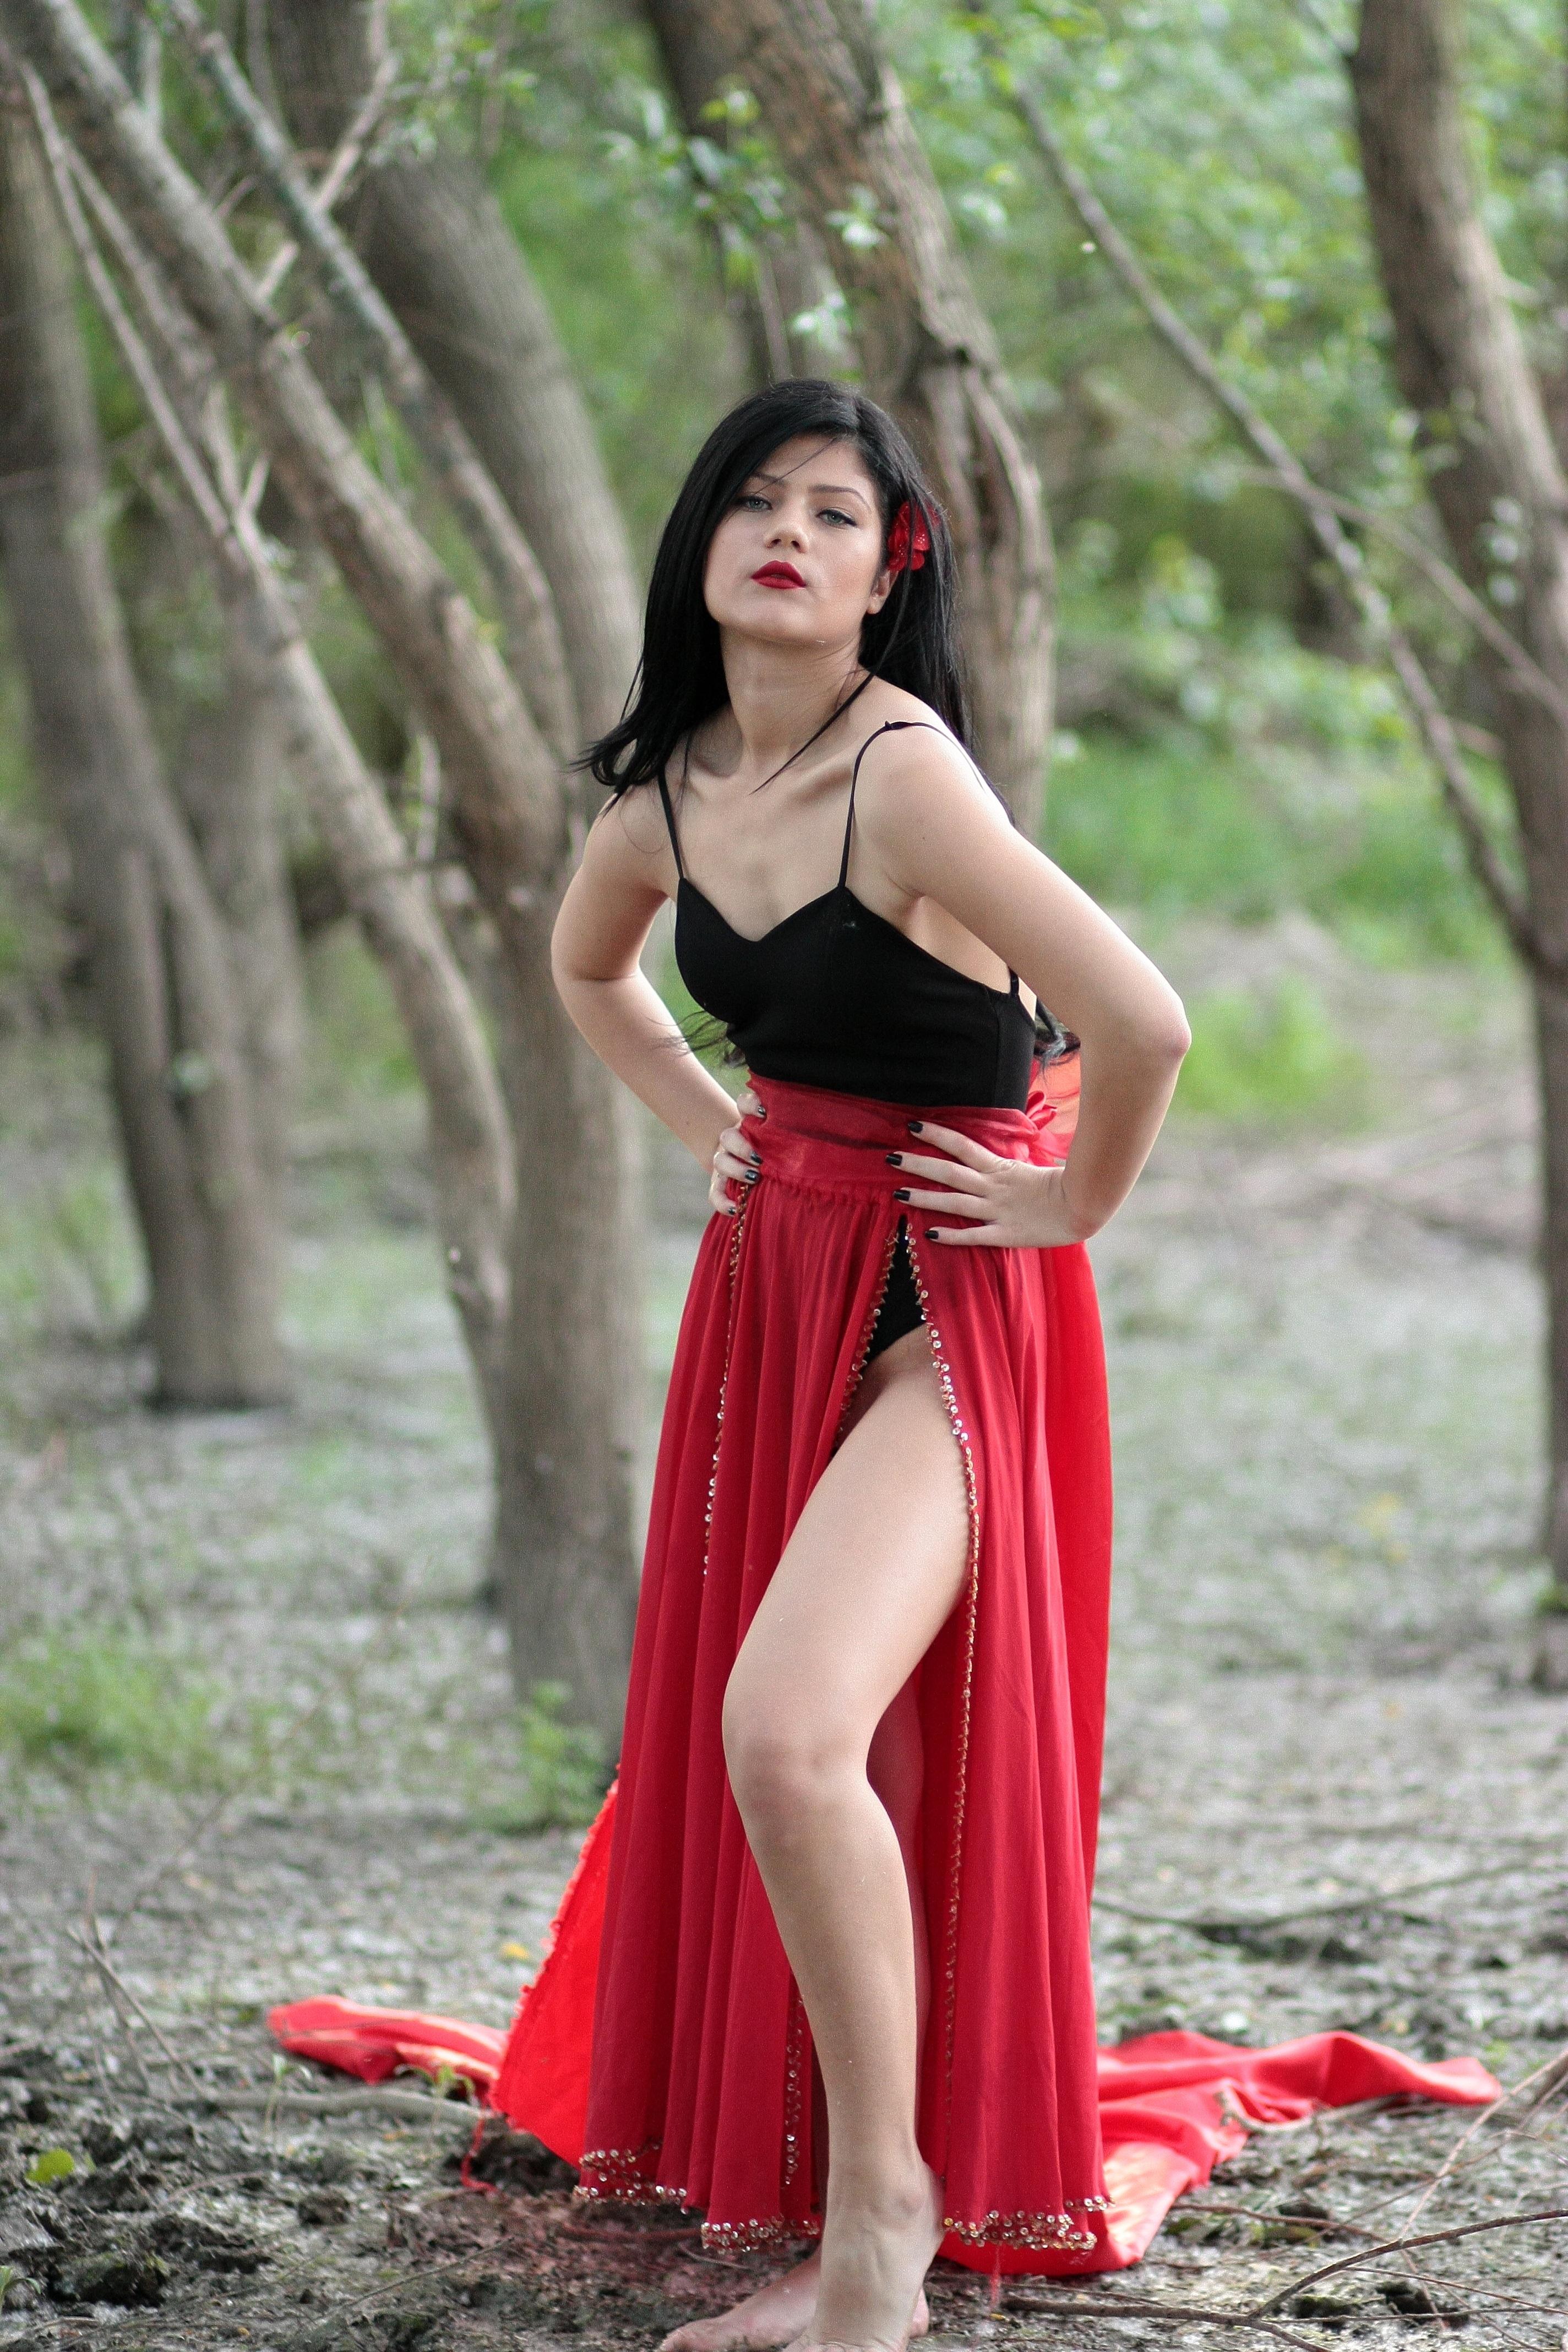 Free Images  Forest, Girl, Woman, Trunk, Leg, Brunette -2857